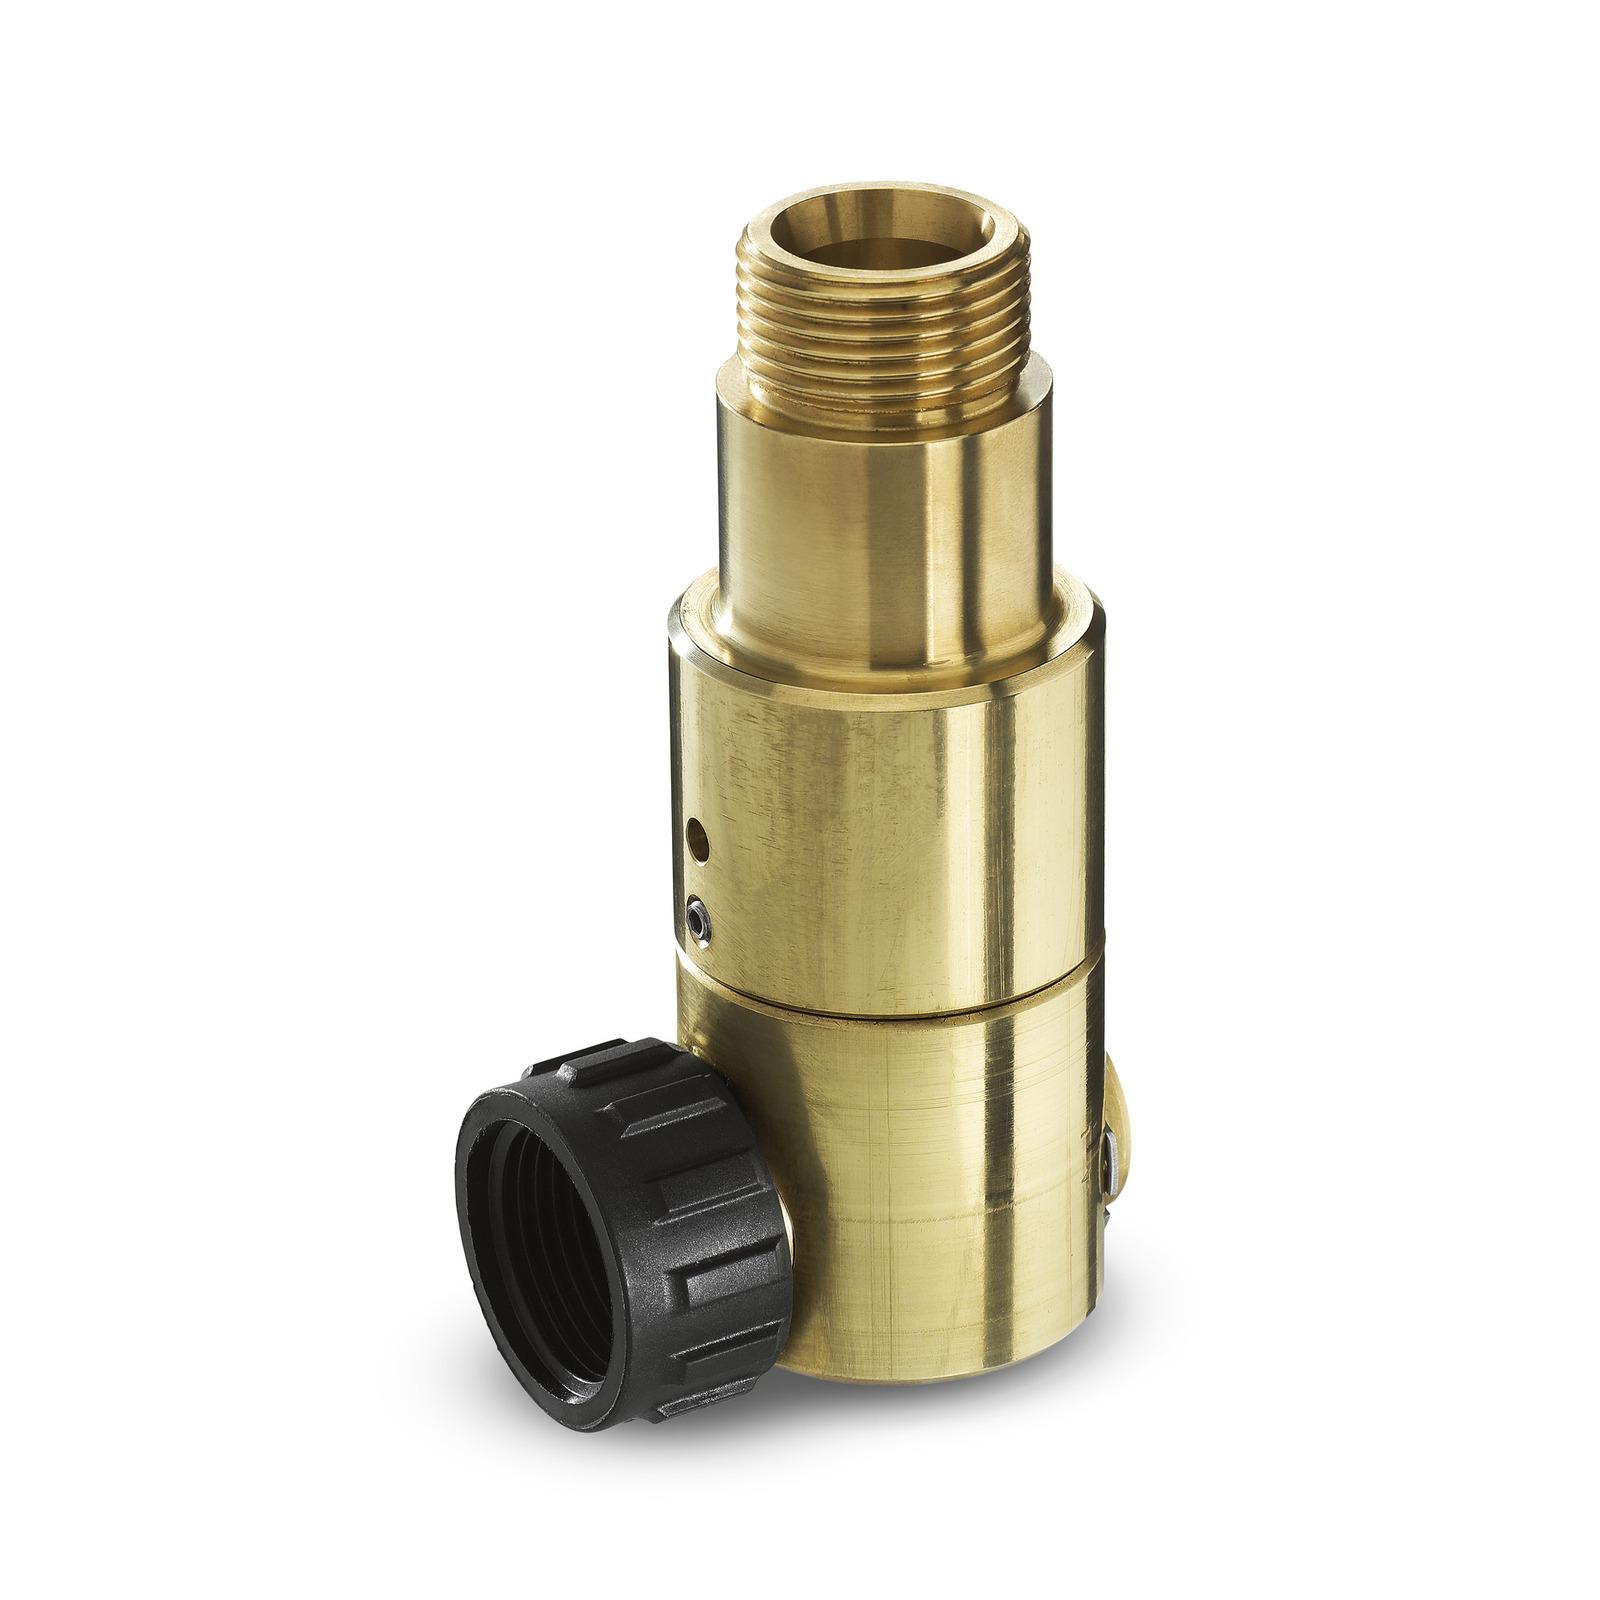 High Pressure Washer Hd 1050 De K 228 Rcher Uk